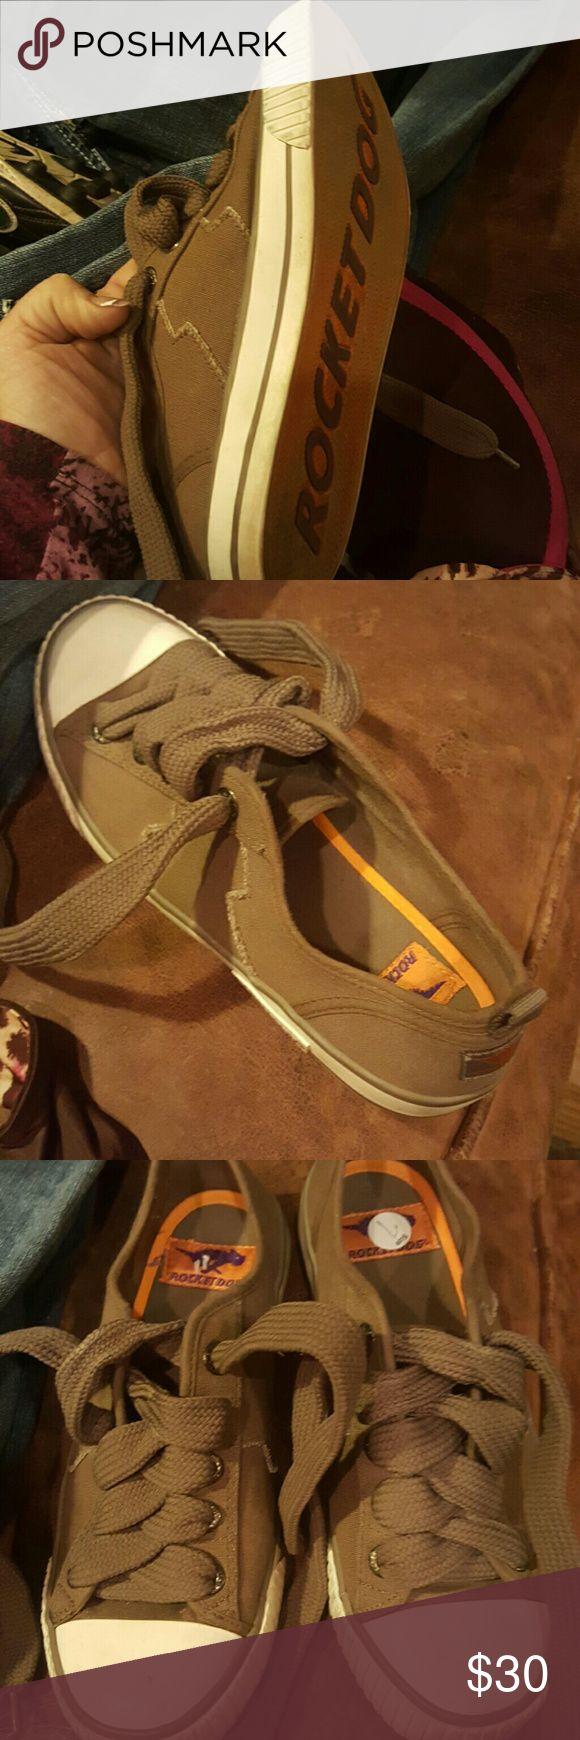 Rocket dog sneakers 7 tennis shoes Rocket dog sneakers 7 tennis shoes Shoes Sneakers